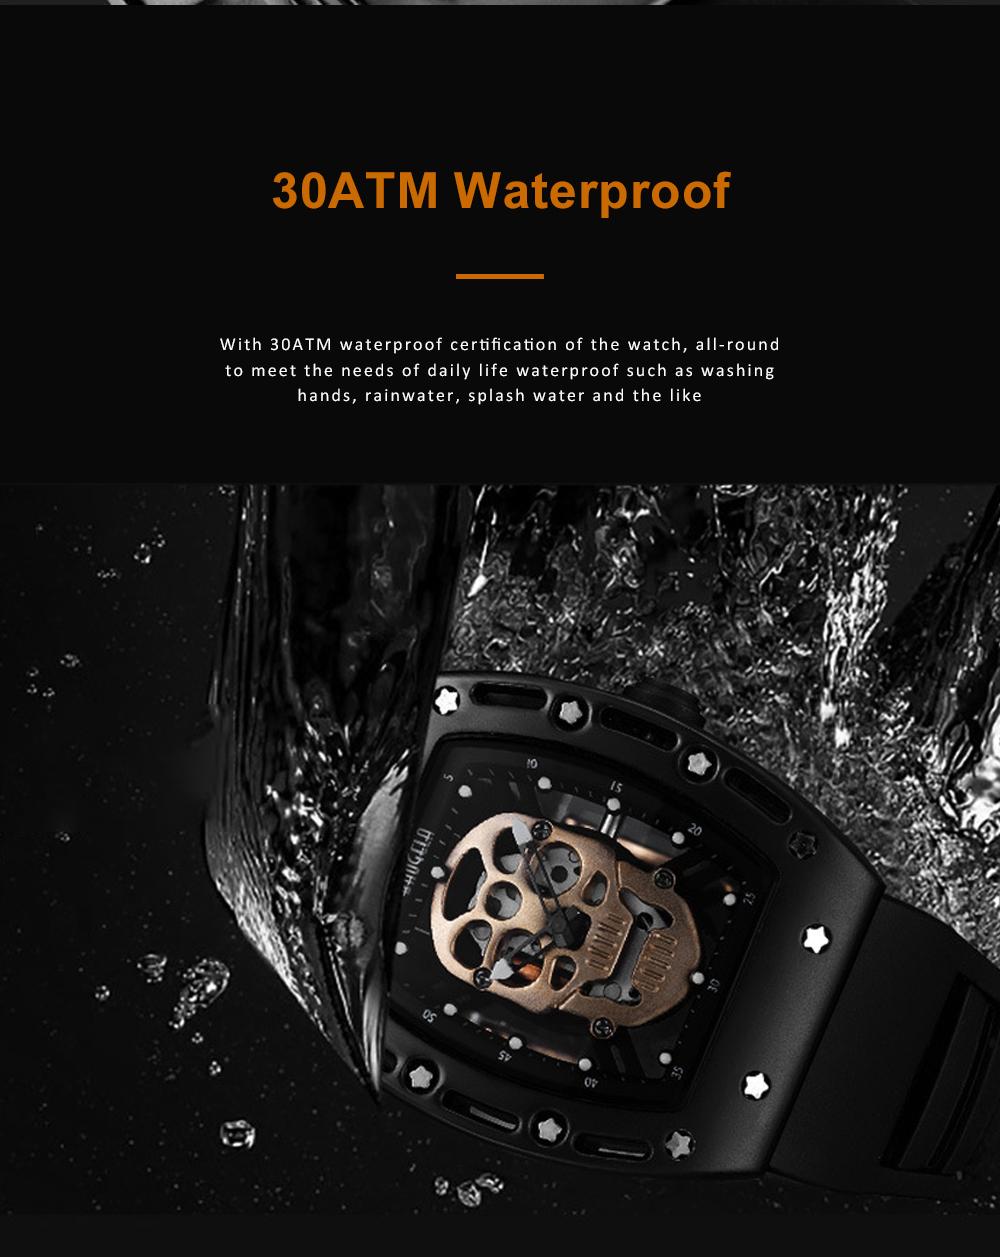 2020 Hot Sell Watches Men Luxury Brand Automatic Silicone Shantou Hollow Men's Quartz Watch Waterproof Movement 5